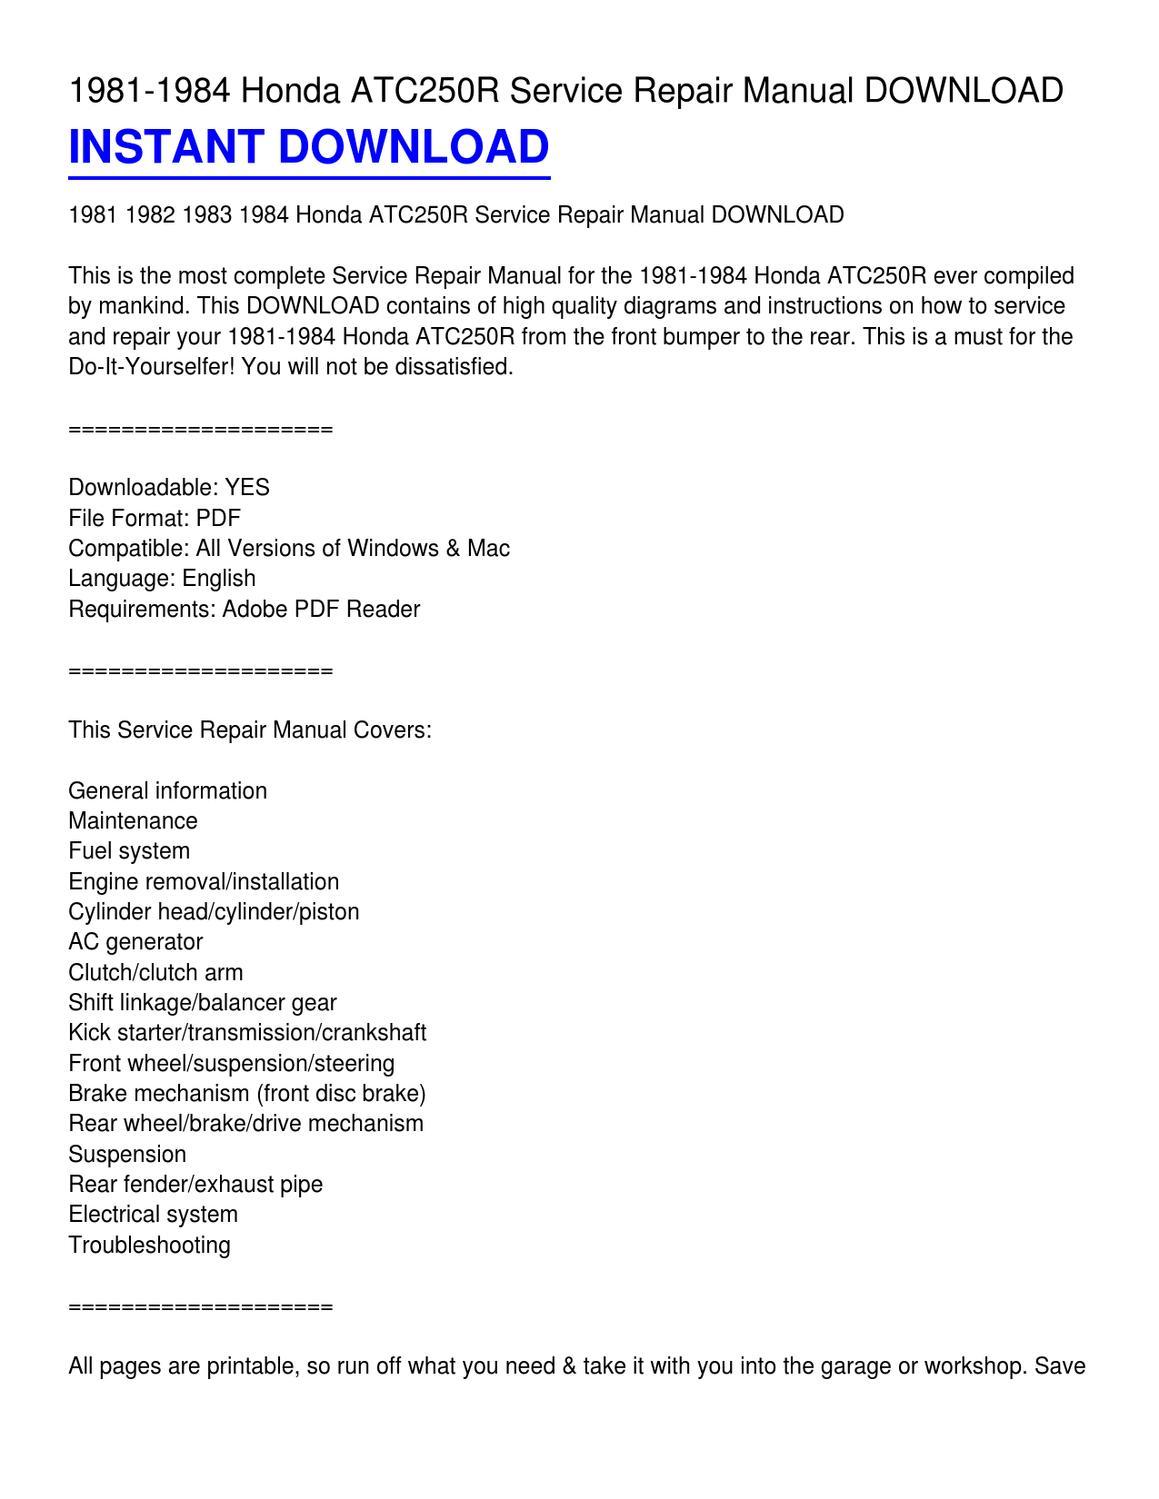 1981-1984 Honda ATC250R Service Repair Manual DOWNLOAD by Lester Church -  issuu